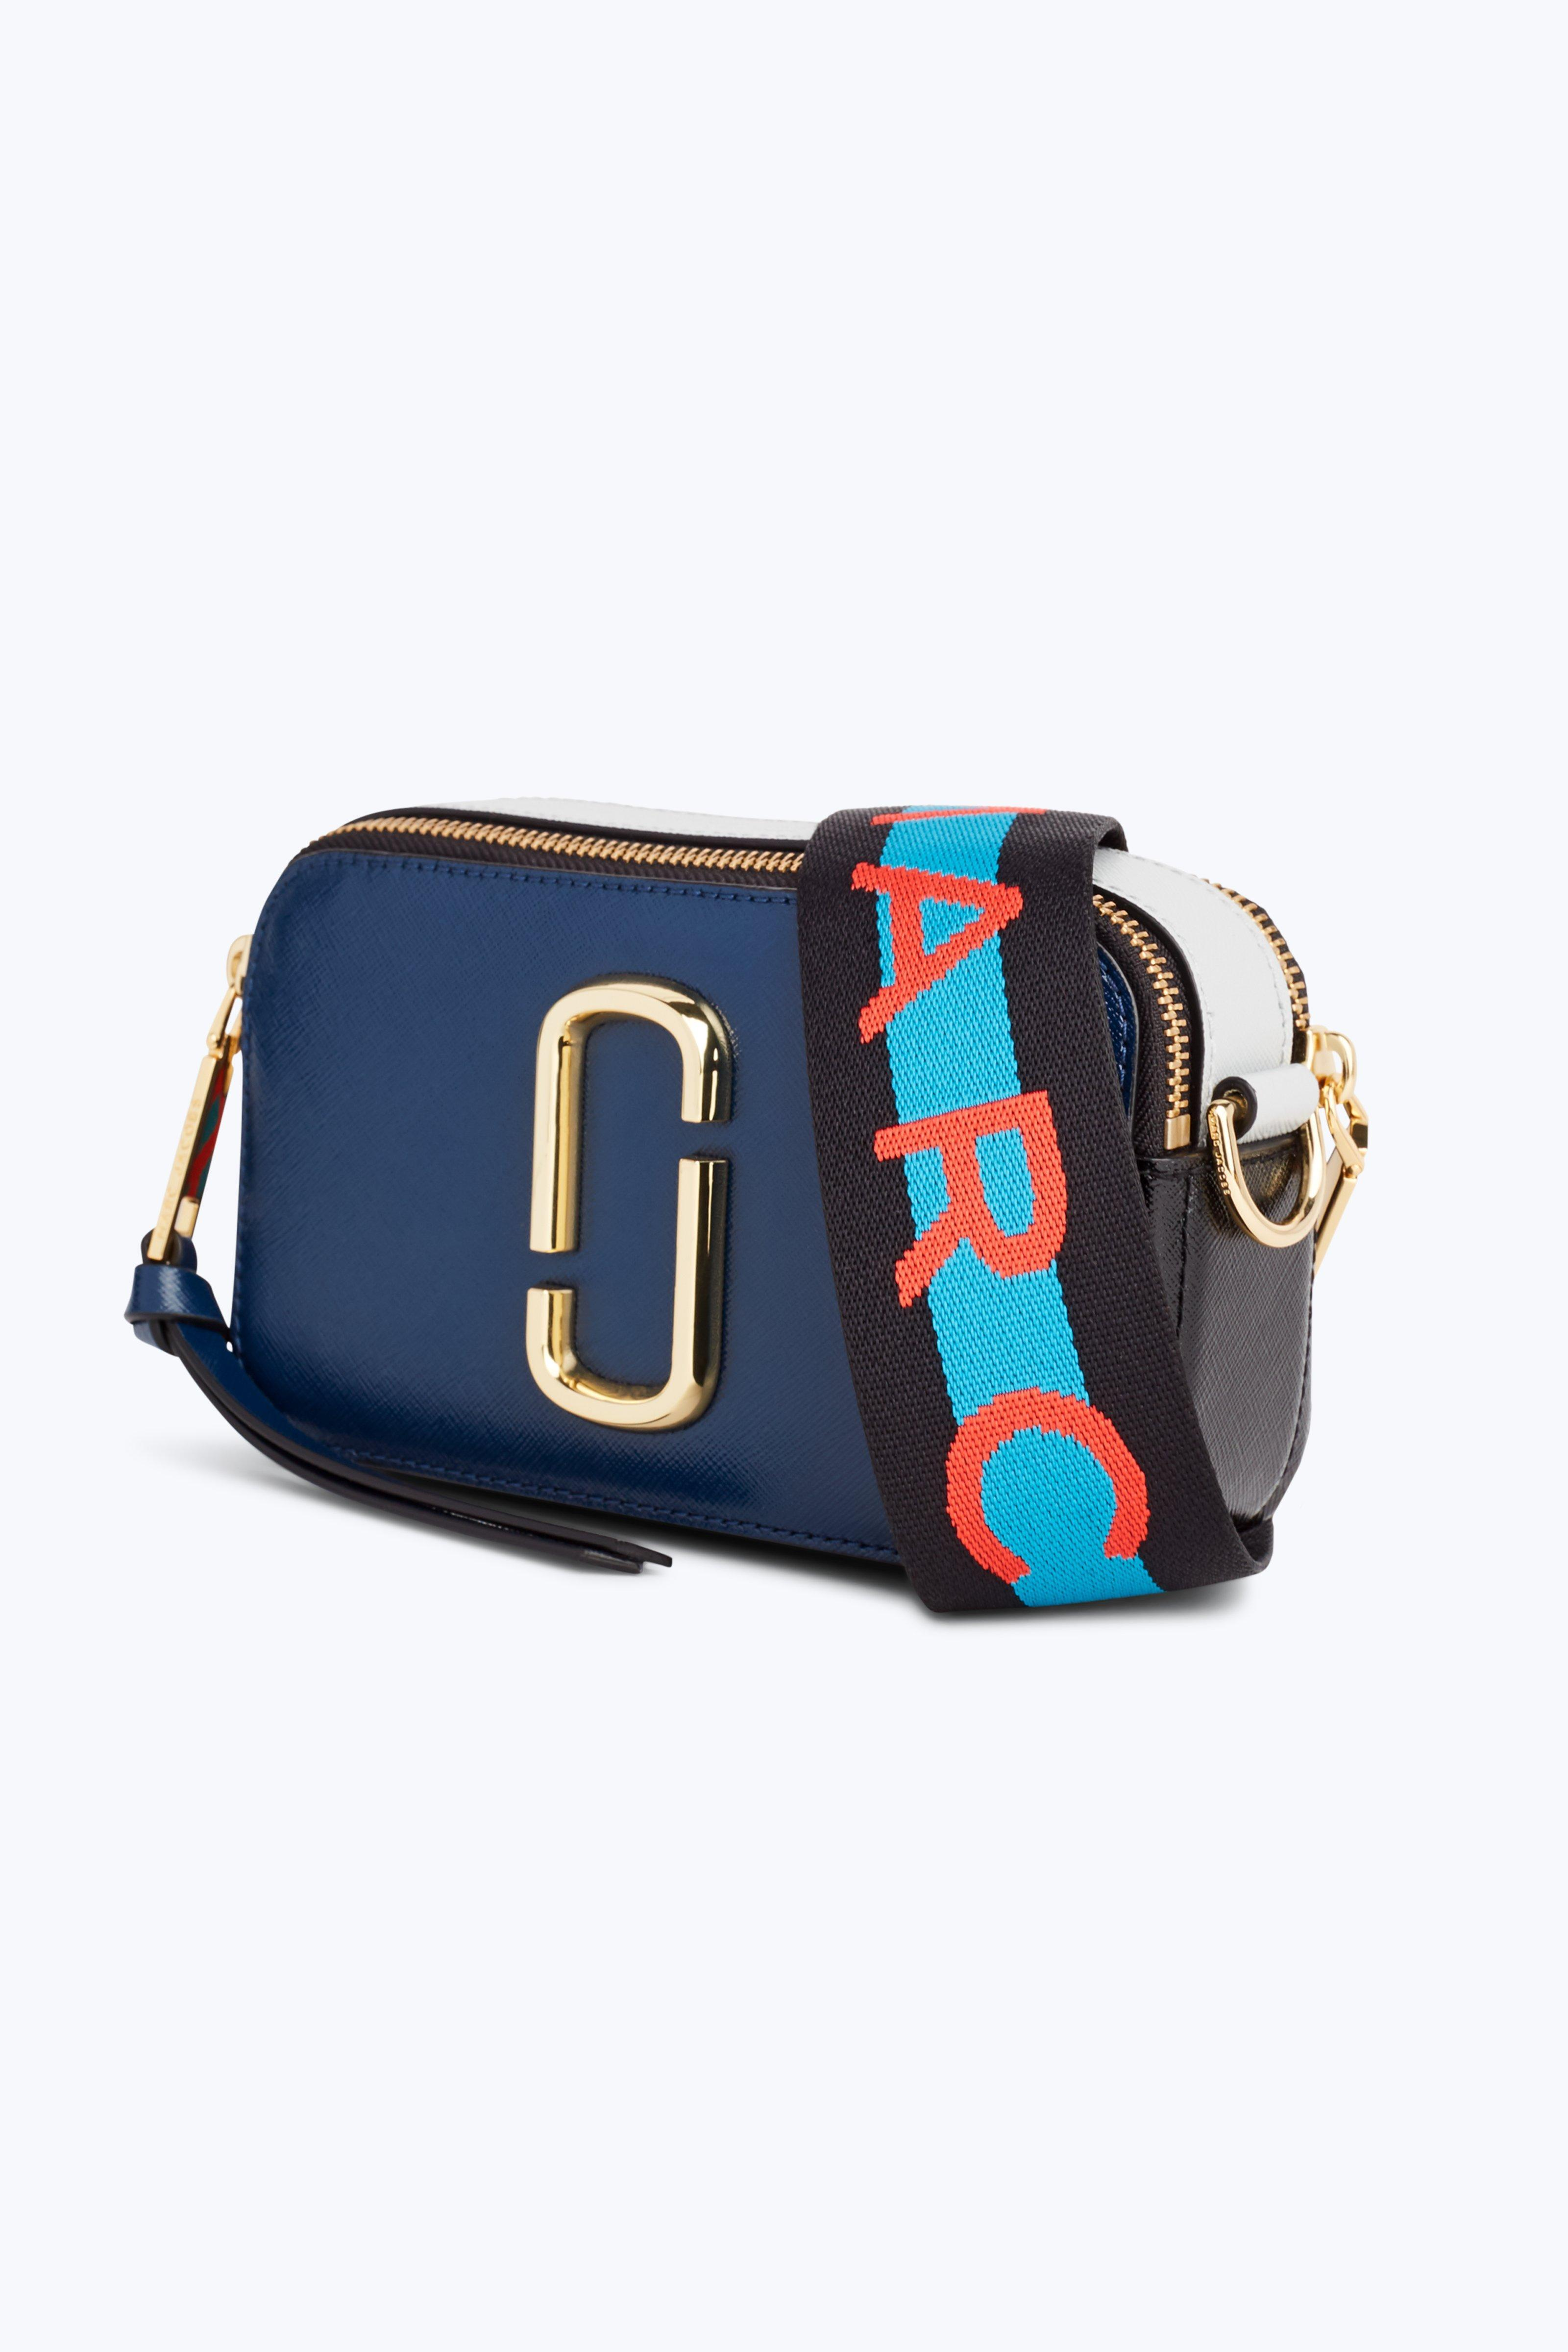 b9ebd2ead54b Marc Jacobs Logo Strap Snapshot Small Camera Bag In Sea Blue